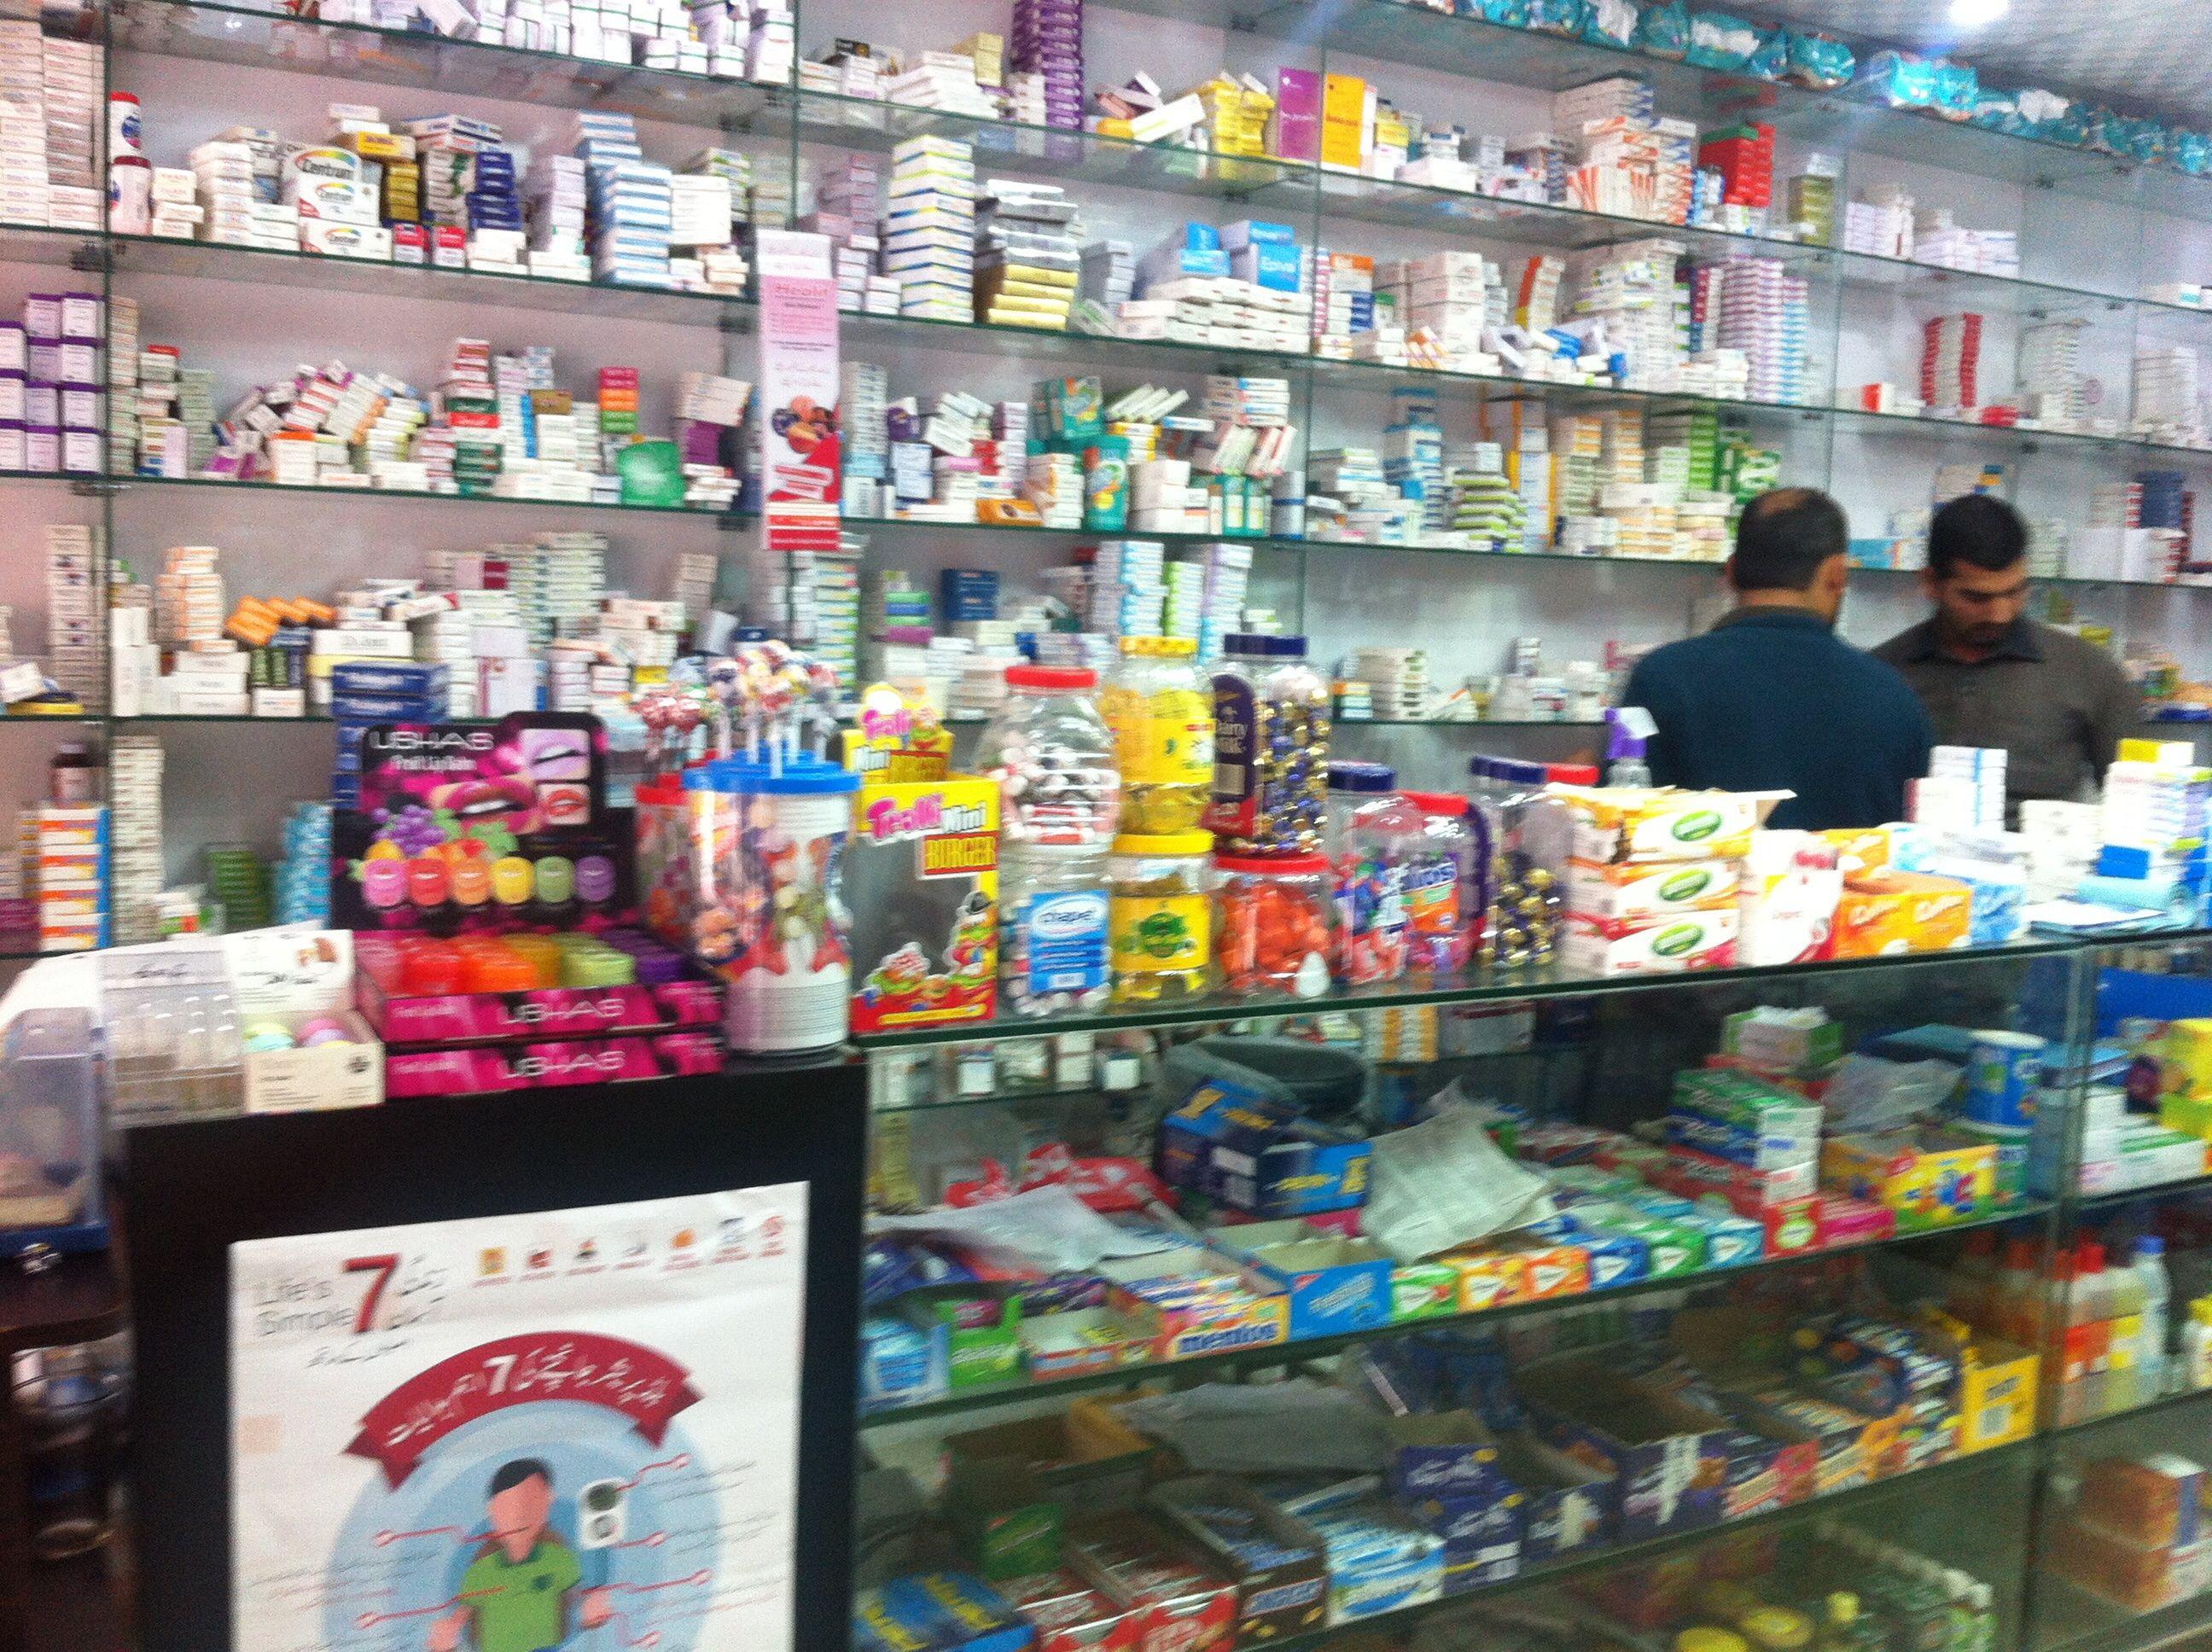 Medi Serve Pharmacy F 10 Markaz Islamabad Online Grocery Store